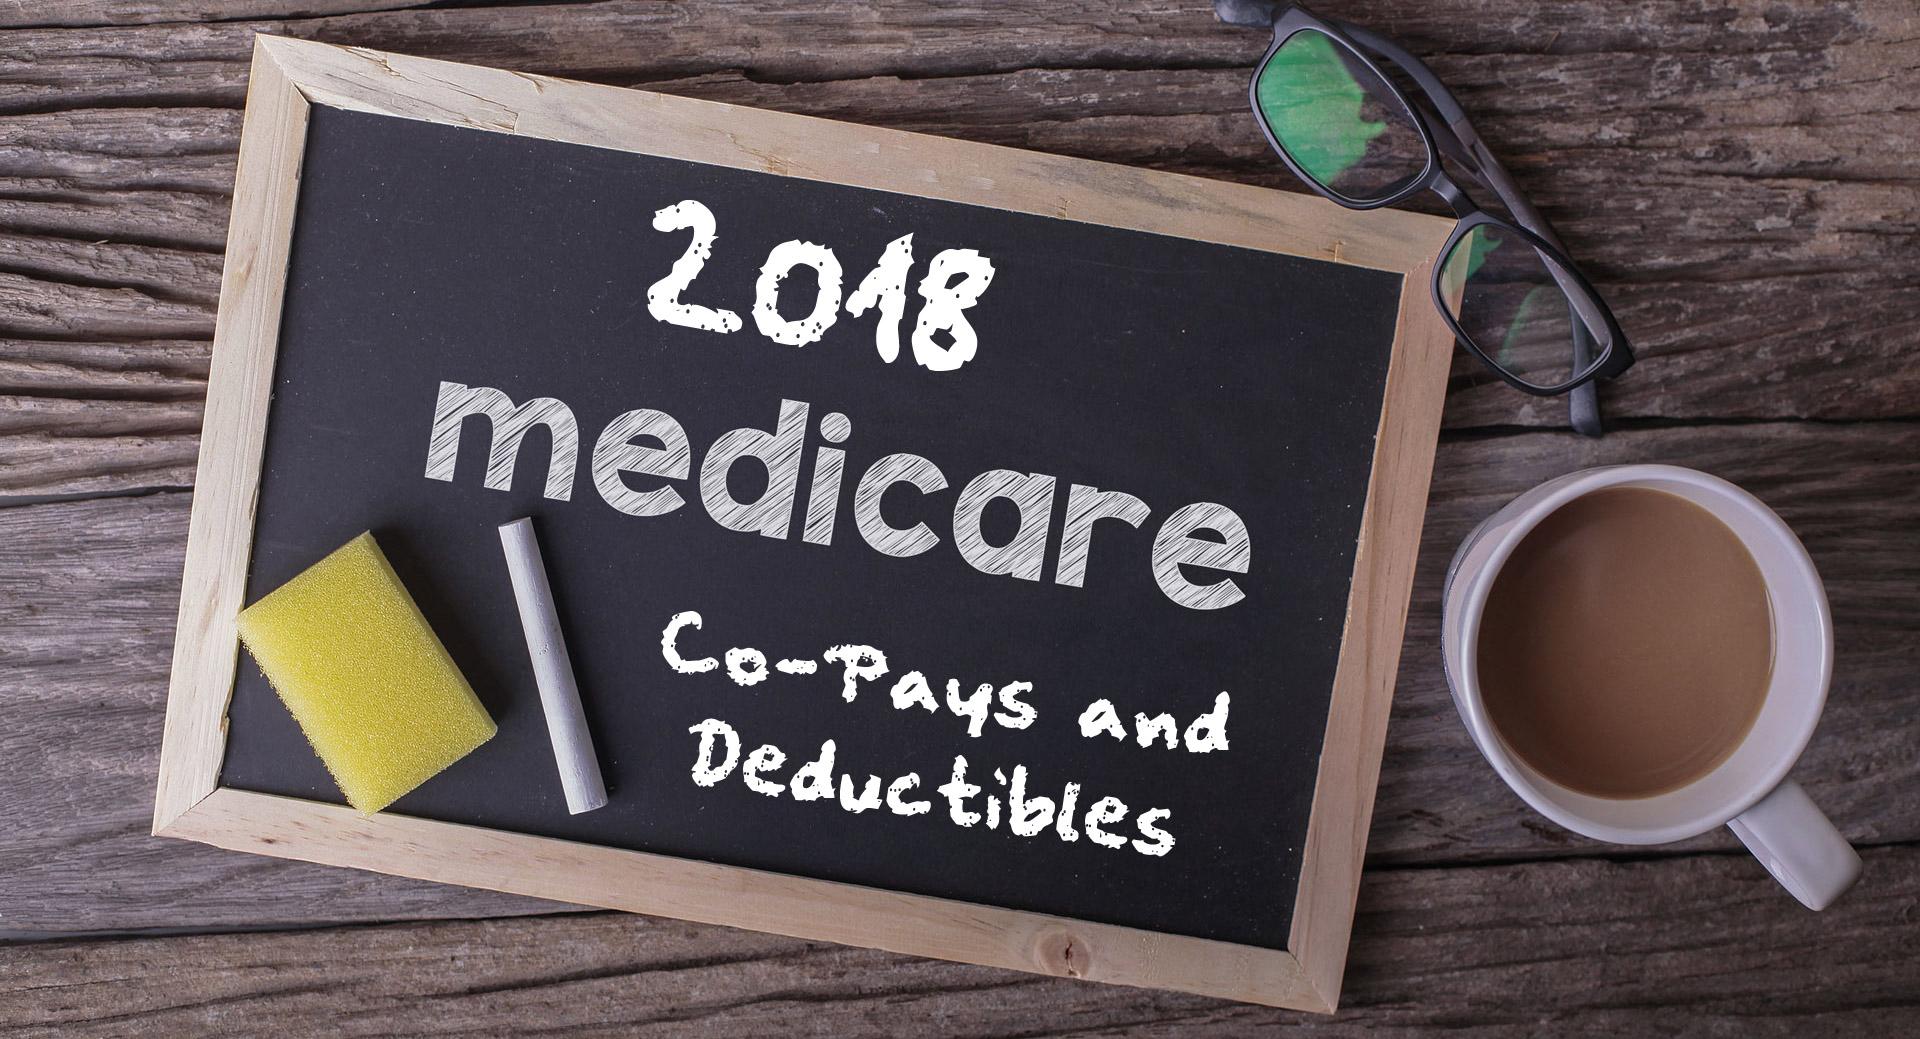 2018MedicareBackground.jpg